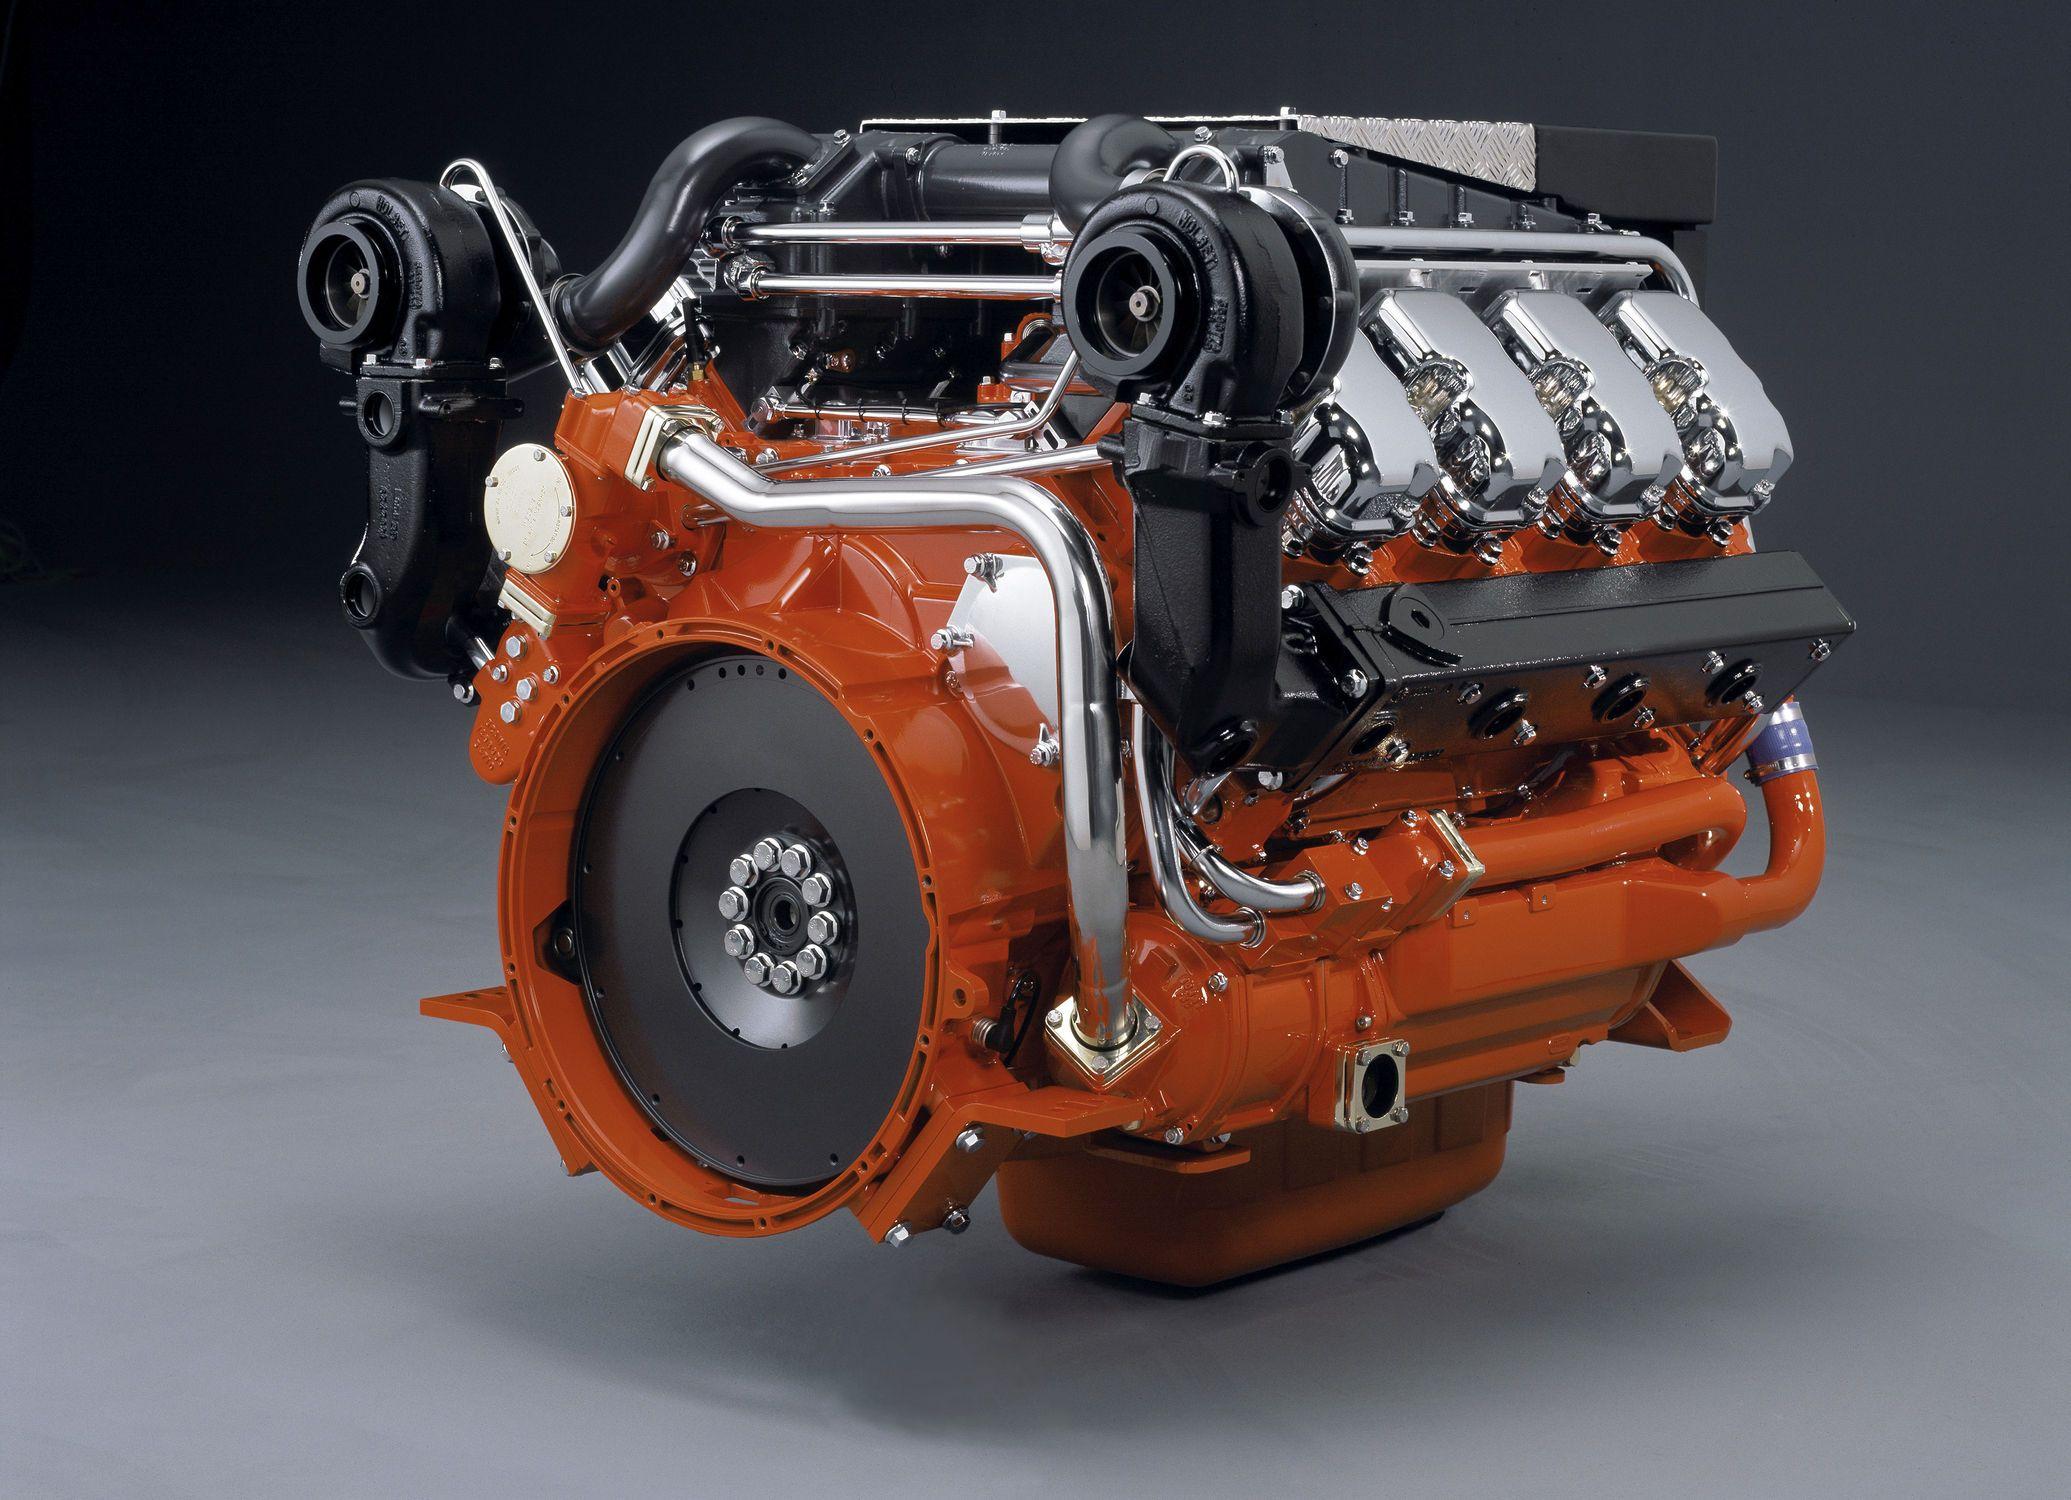 Marine auxiliary diesel engine 164 l 1500 1800 rpm 430 640 kw marine auxiliary diesel engine 164 l 1500 1800 rpm 430 640 kw di16 series scania industrial marine engines fandeluxe Gallery